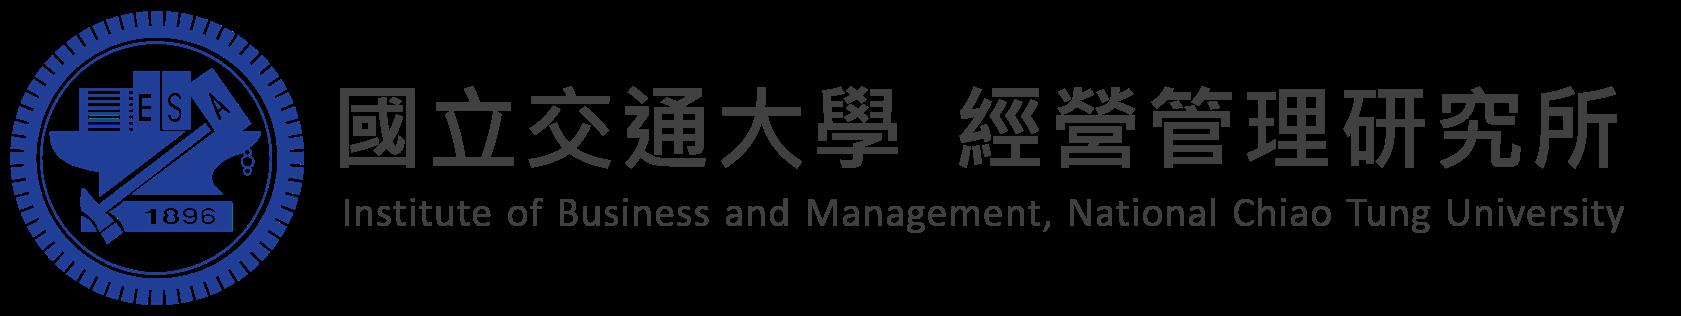 Logo National Chiao-Tung University - Taipei Campus